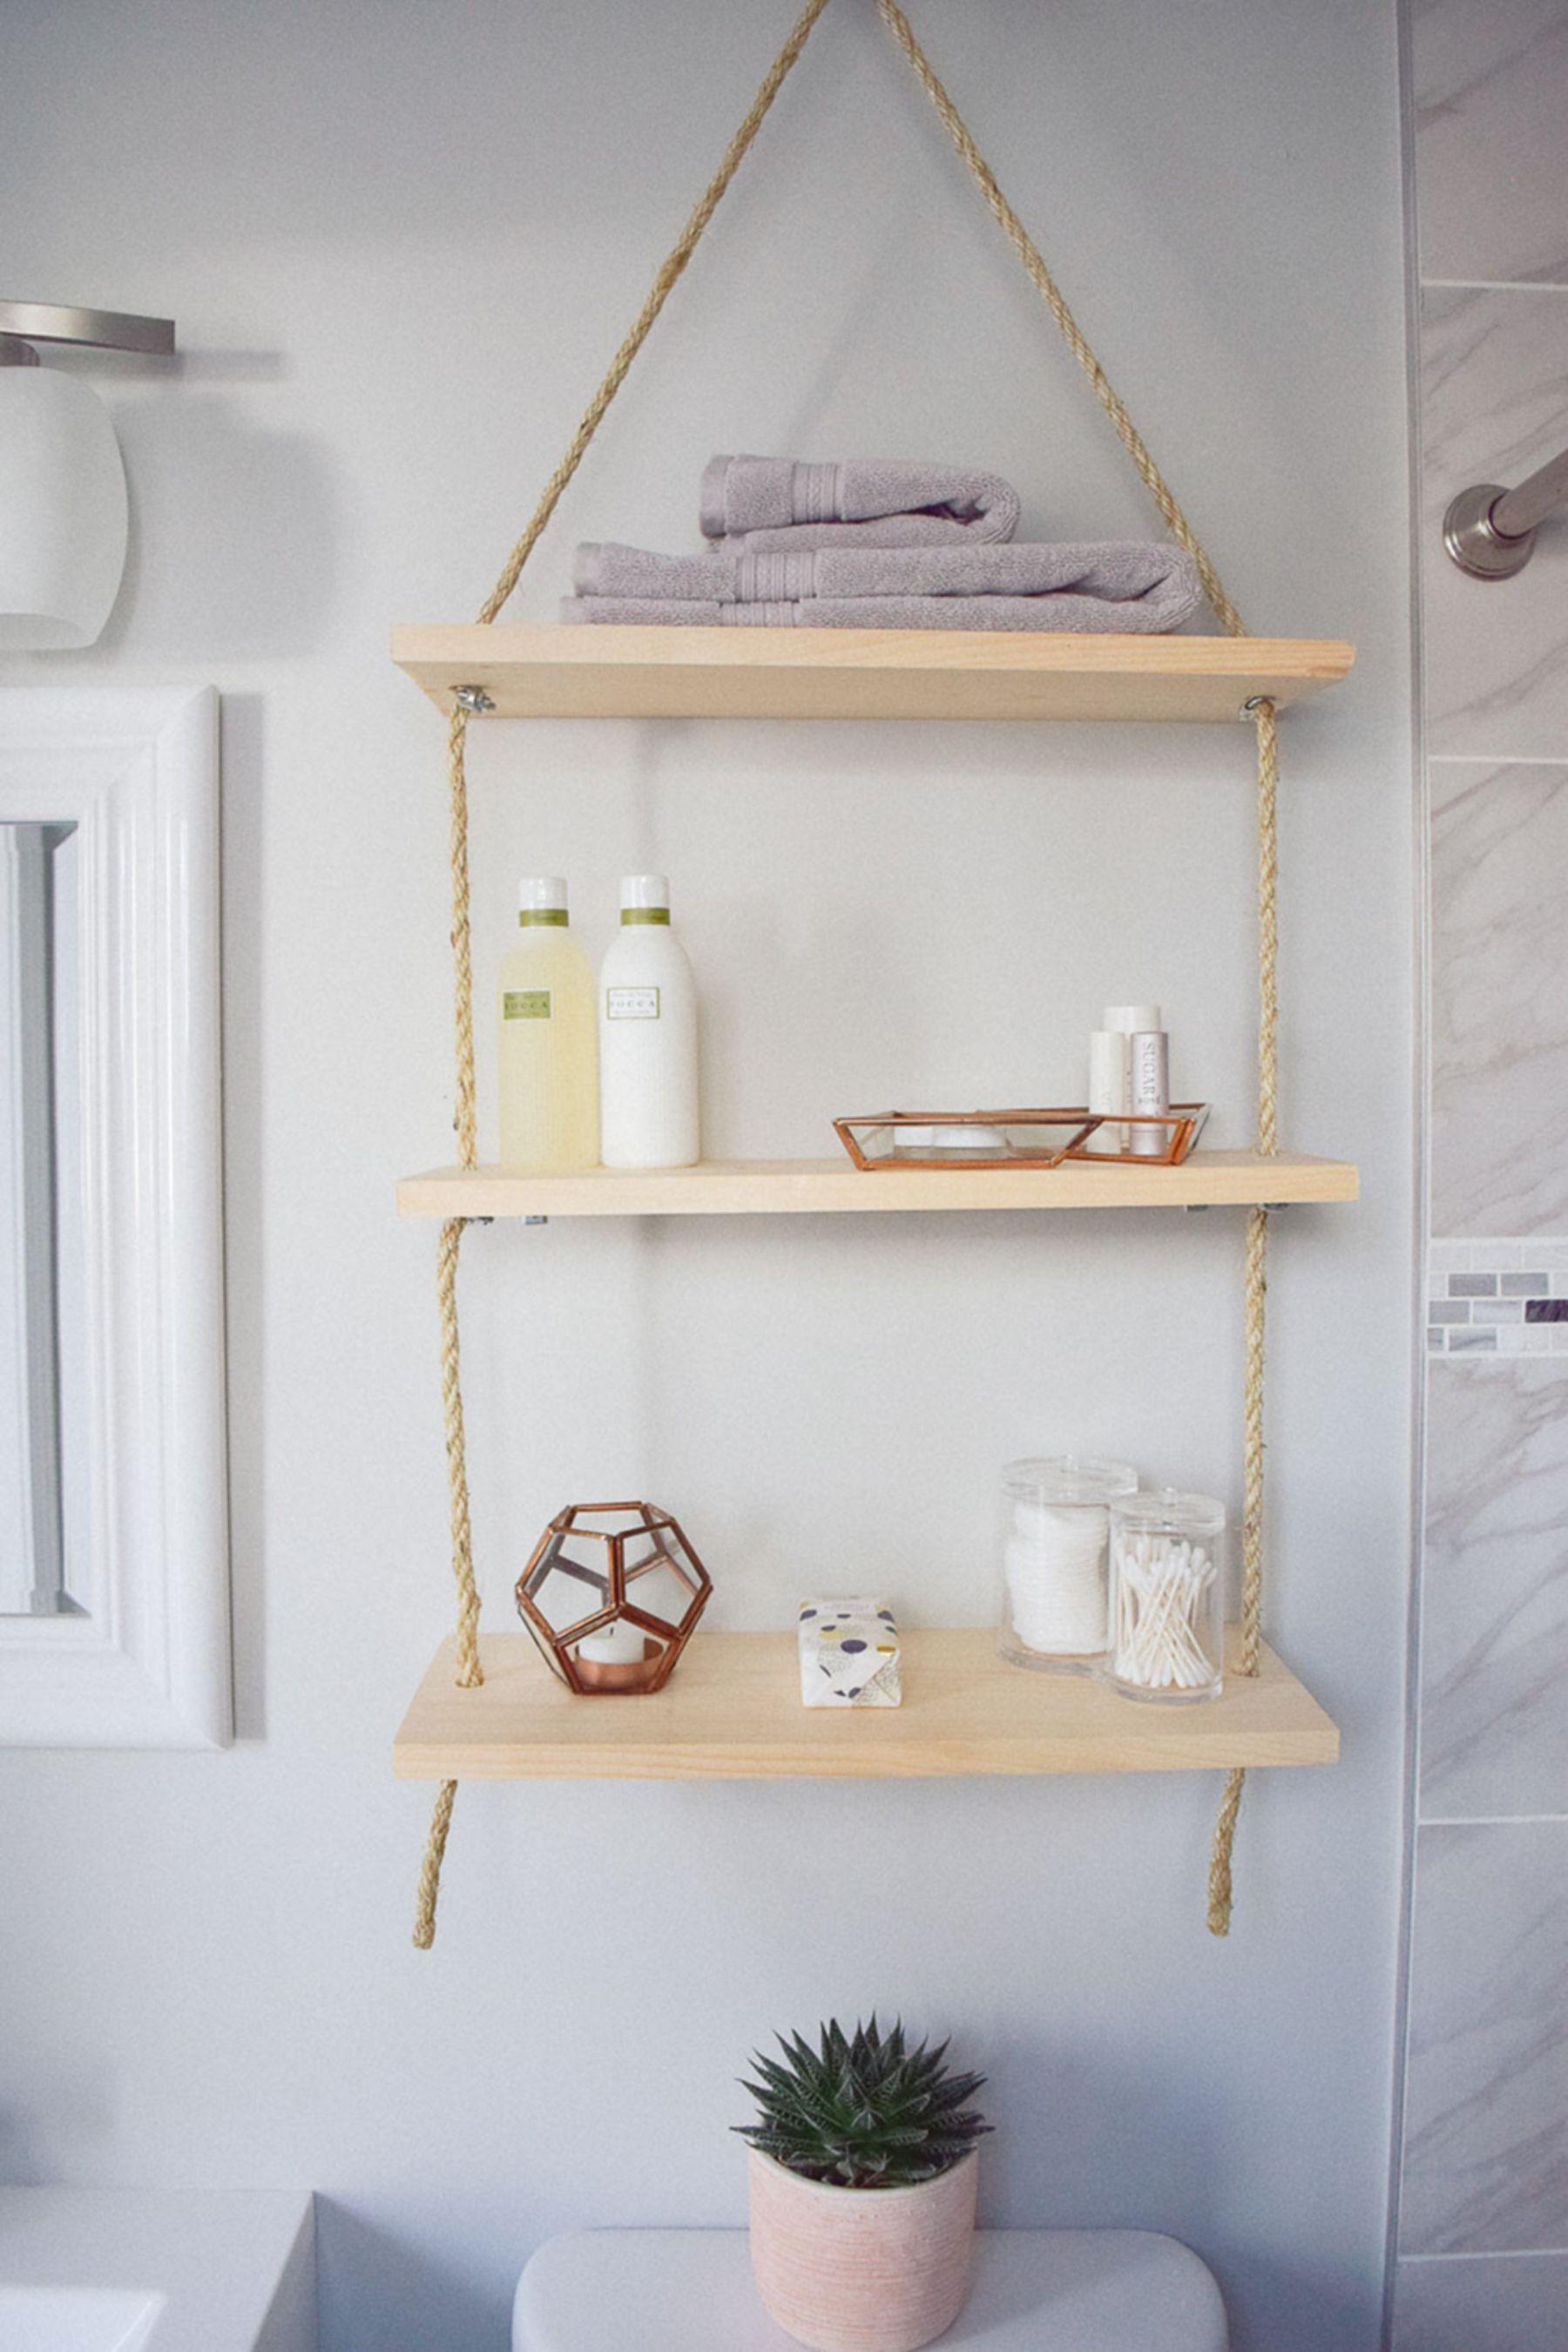 10 Most Creative Rustic Diy Hanging Shelf Design Ideas To Make